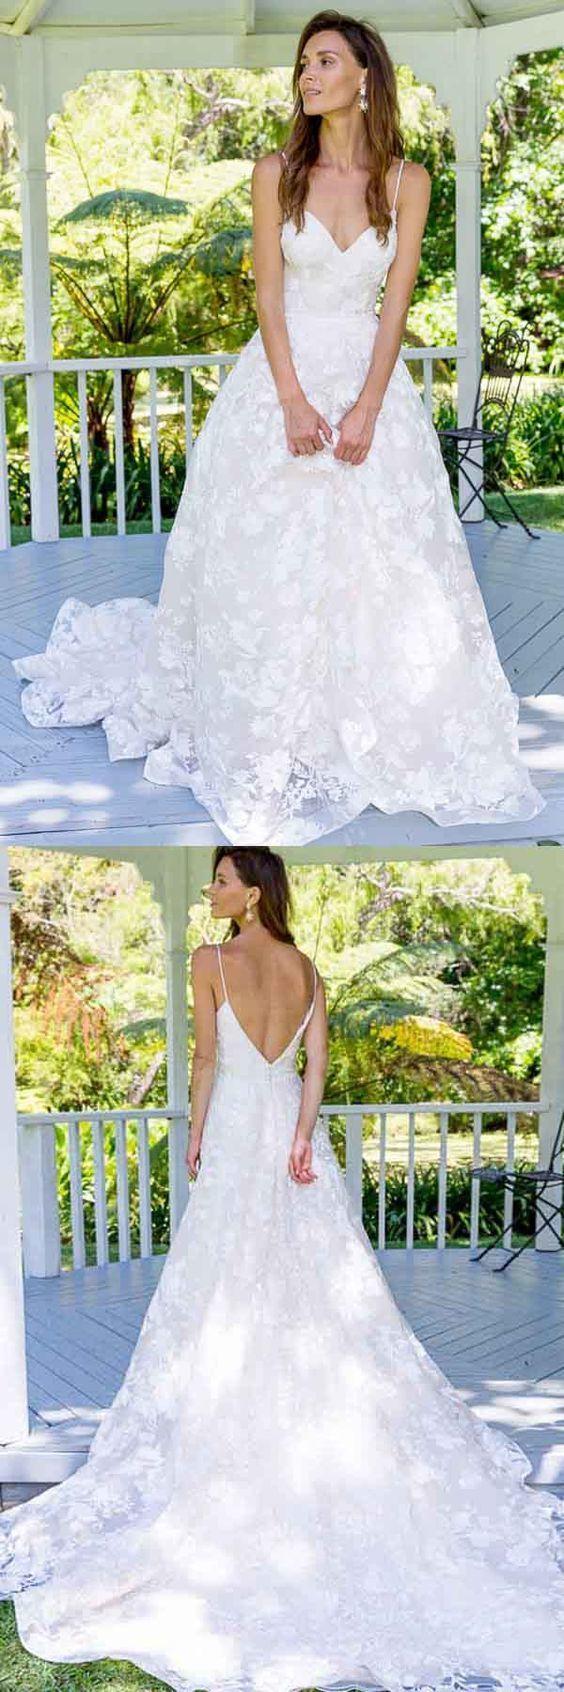 A-Line Spaghetti Straps Backless Long Lace Wedding Dress